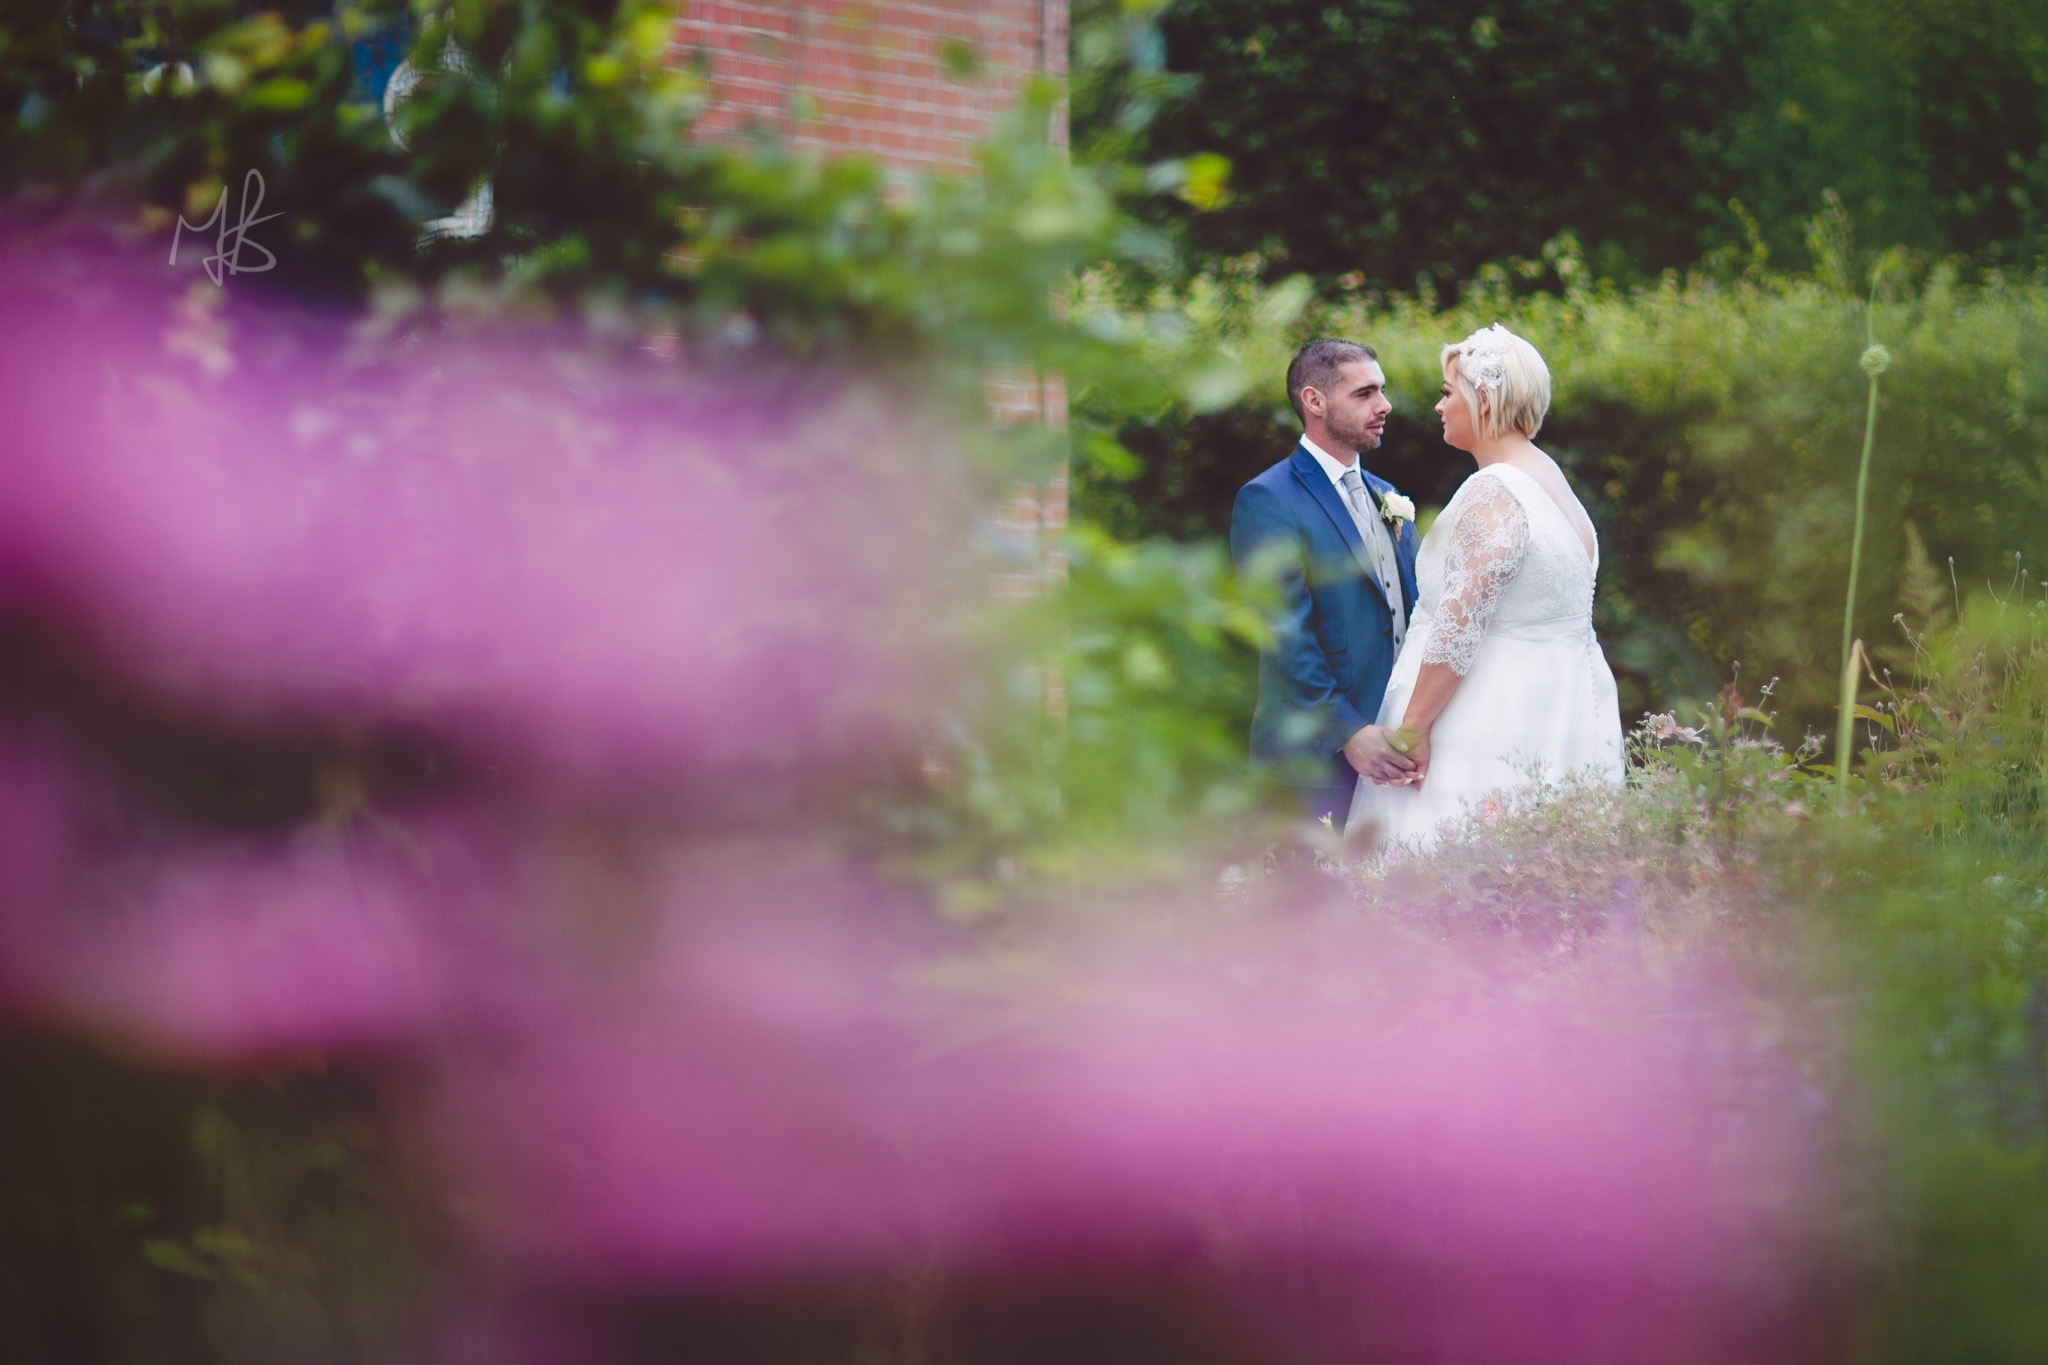 Northern-Ireland-Wedding-Photographer-Mark-Barnes-Ballymena_wedding-photography-Leighinmohr-House-Seamas_Alanna_For-web-37.jpg